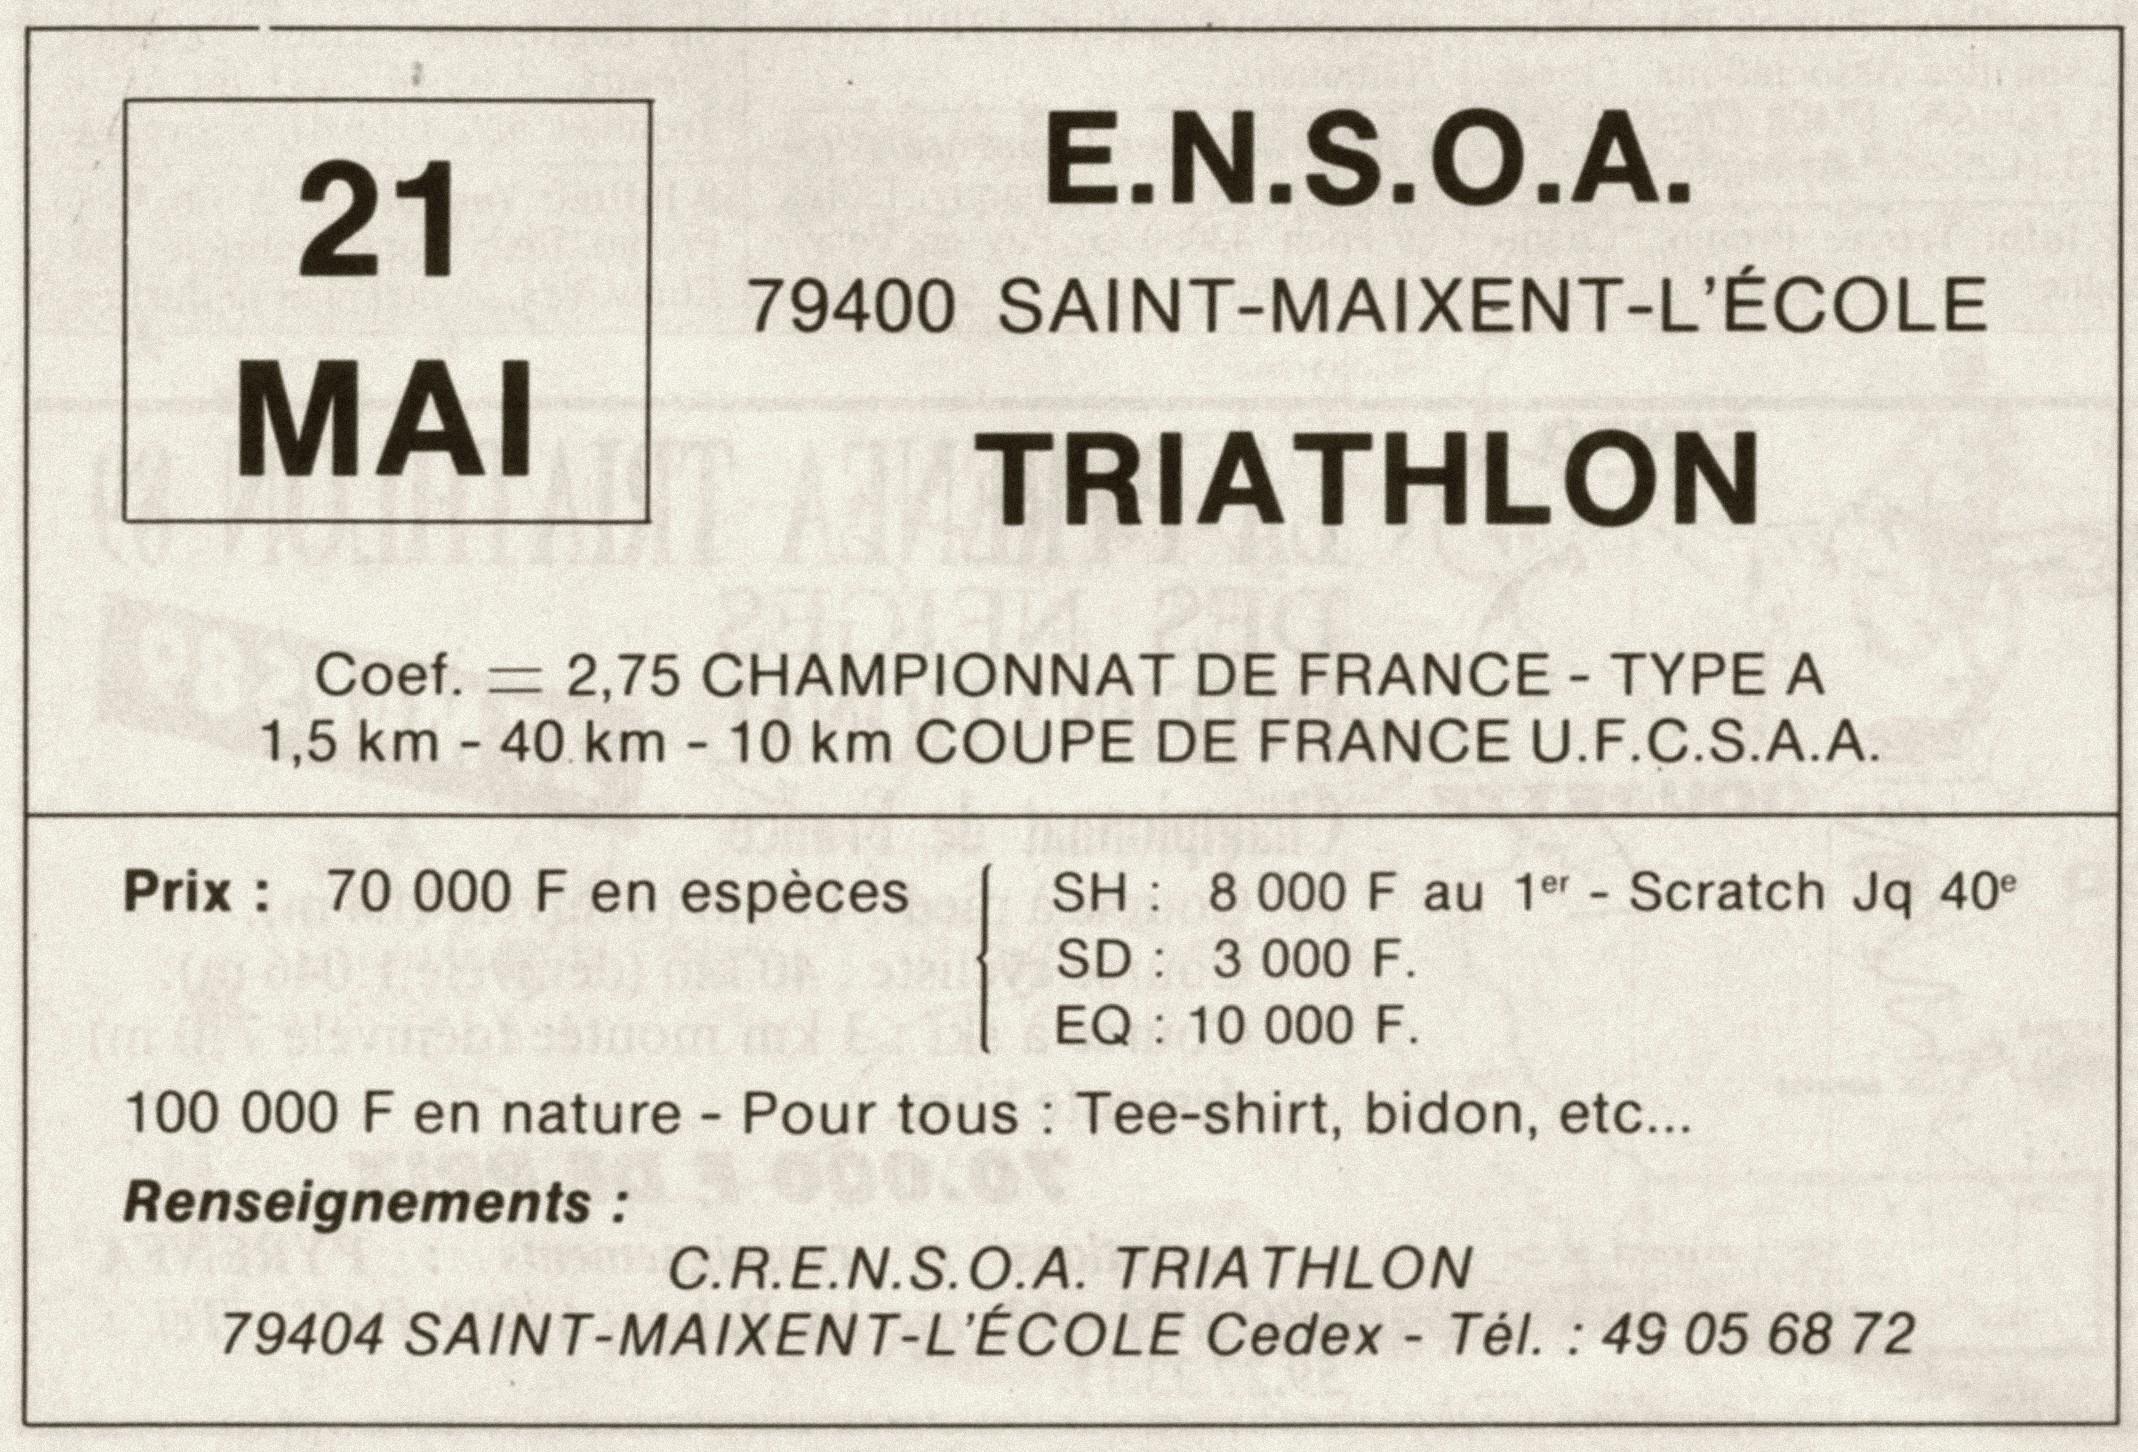 img[A]014_21-mai-1989_ensoa_saint_maixent_l'ecole_pub